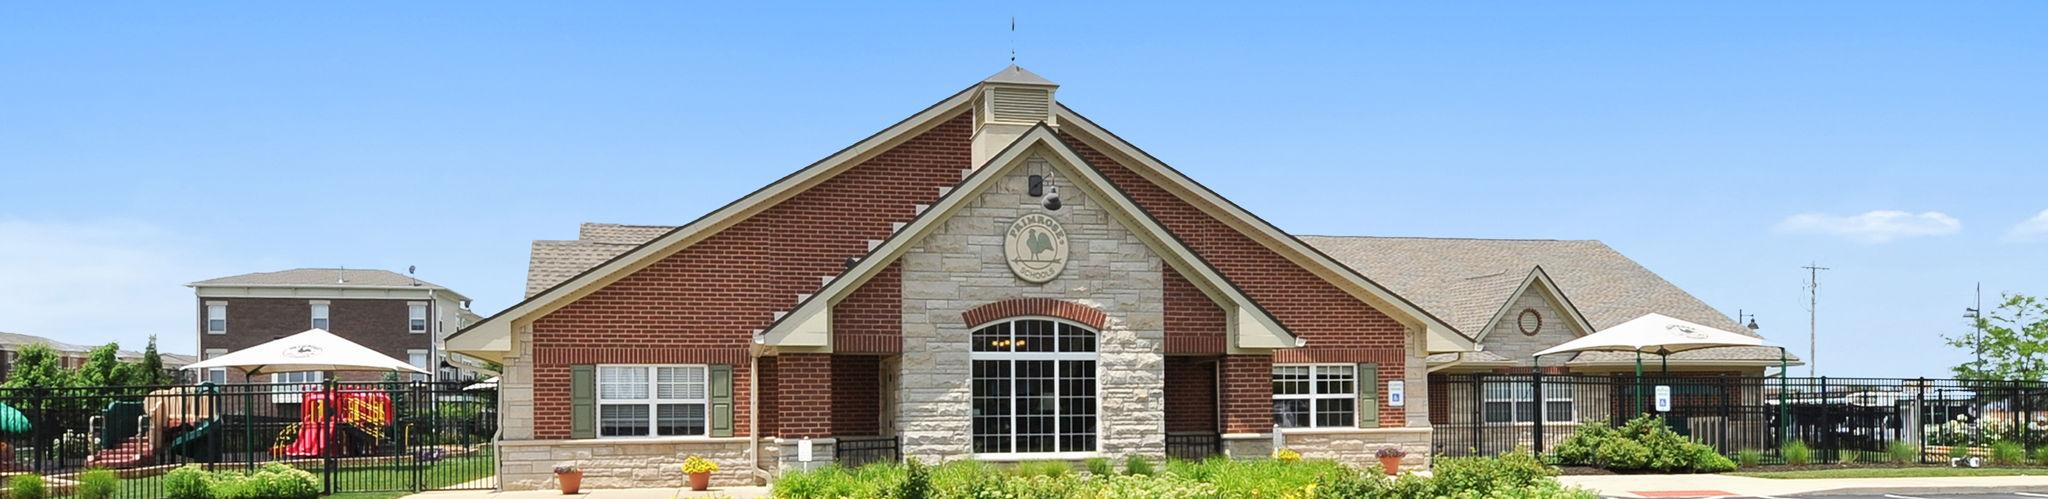 Exterior of a Primrose School at Anson-Zionsville